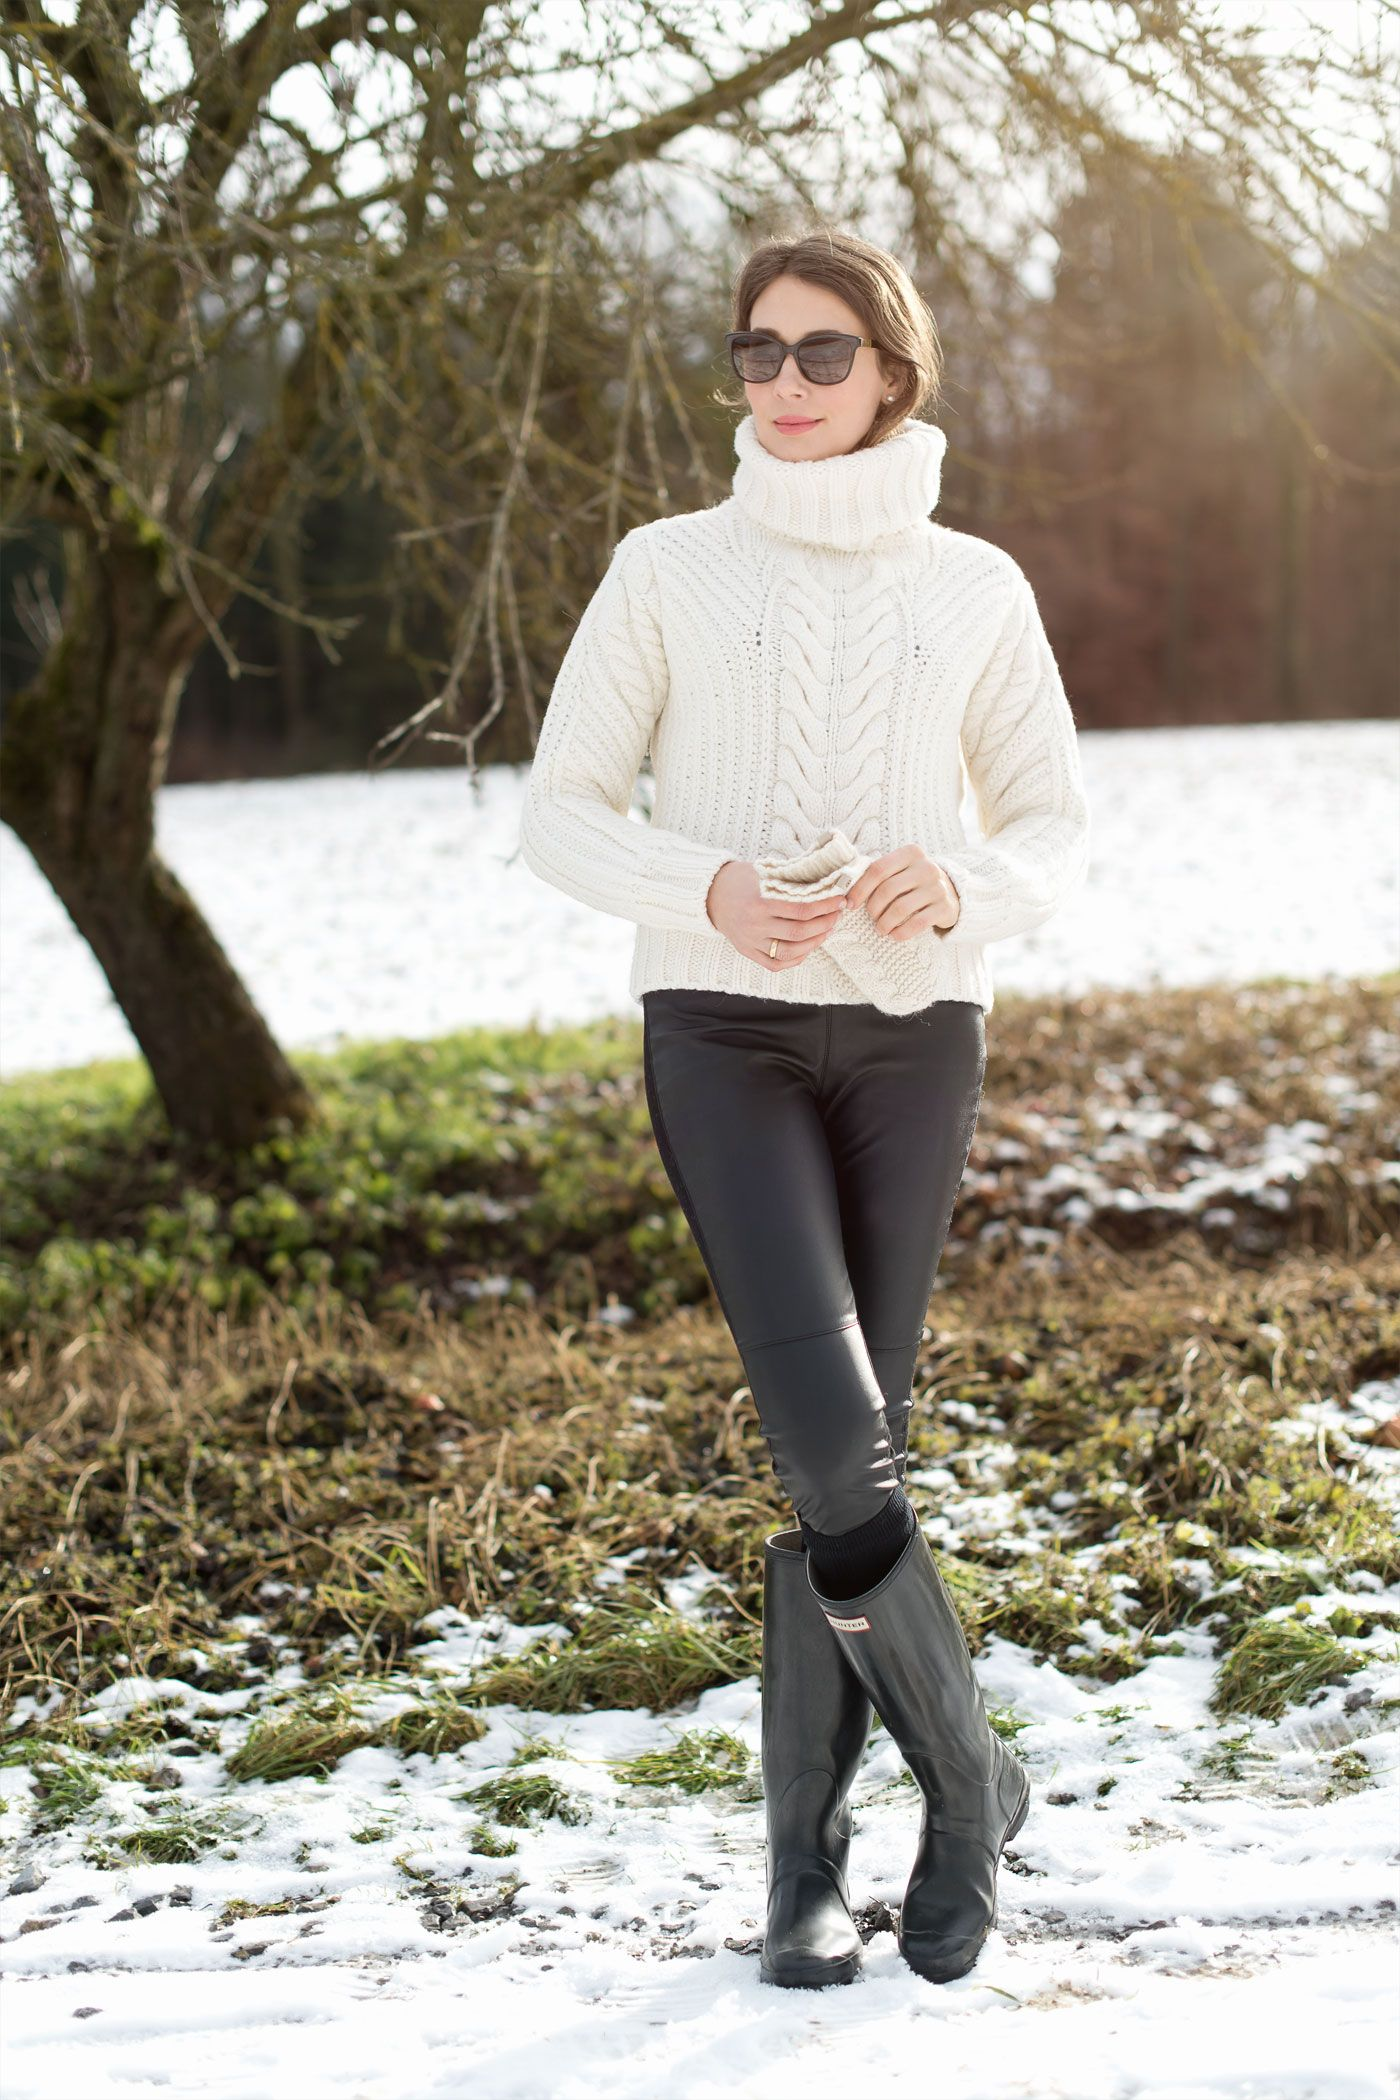 marc o polo wollmantel coat hunter boots tommyhilfiger gigi hadid pullover sweater roeckl. Black Bedroom Furniture Sets. Home Design Ideas